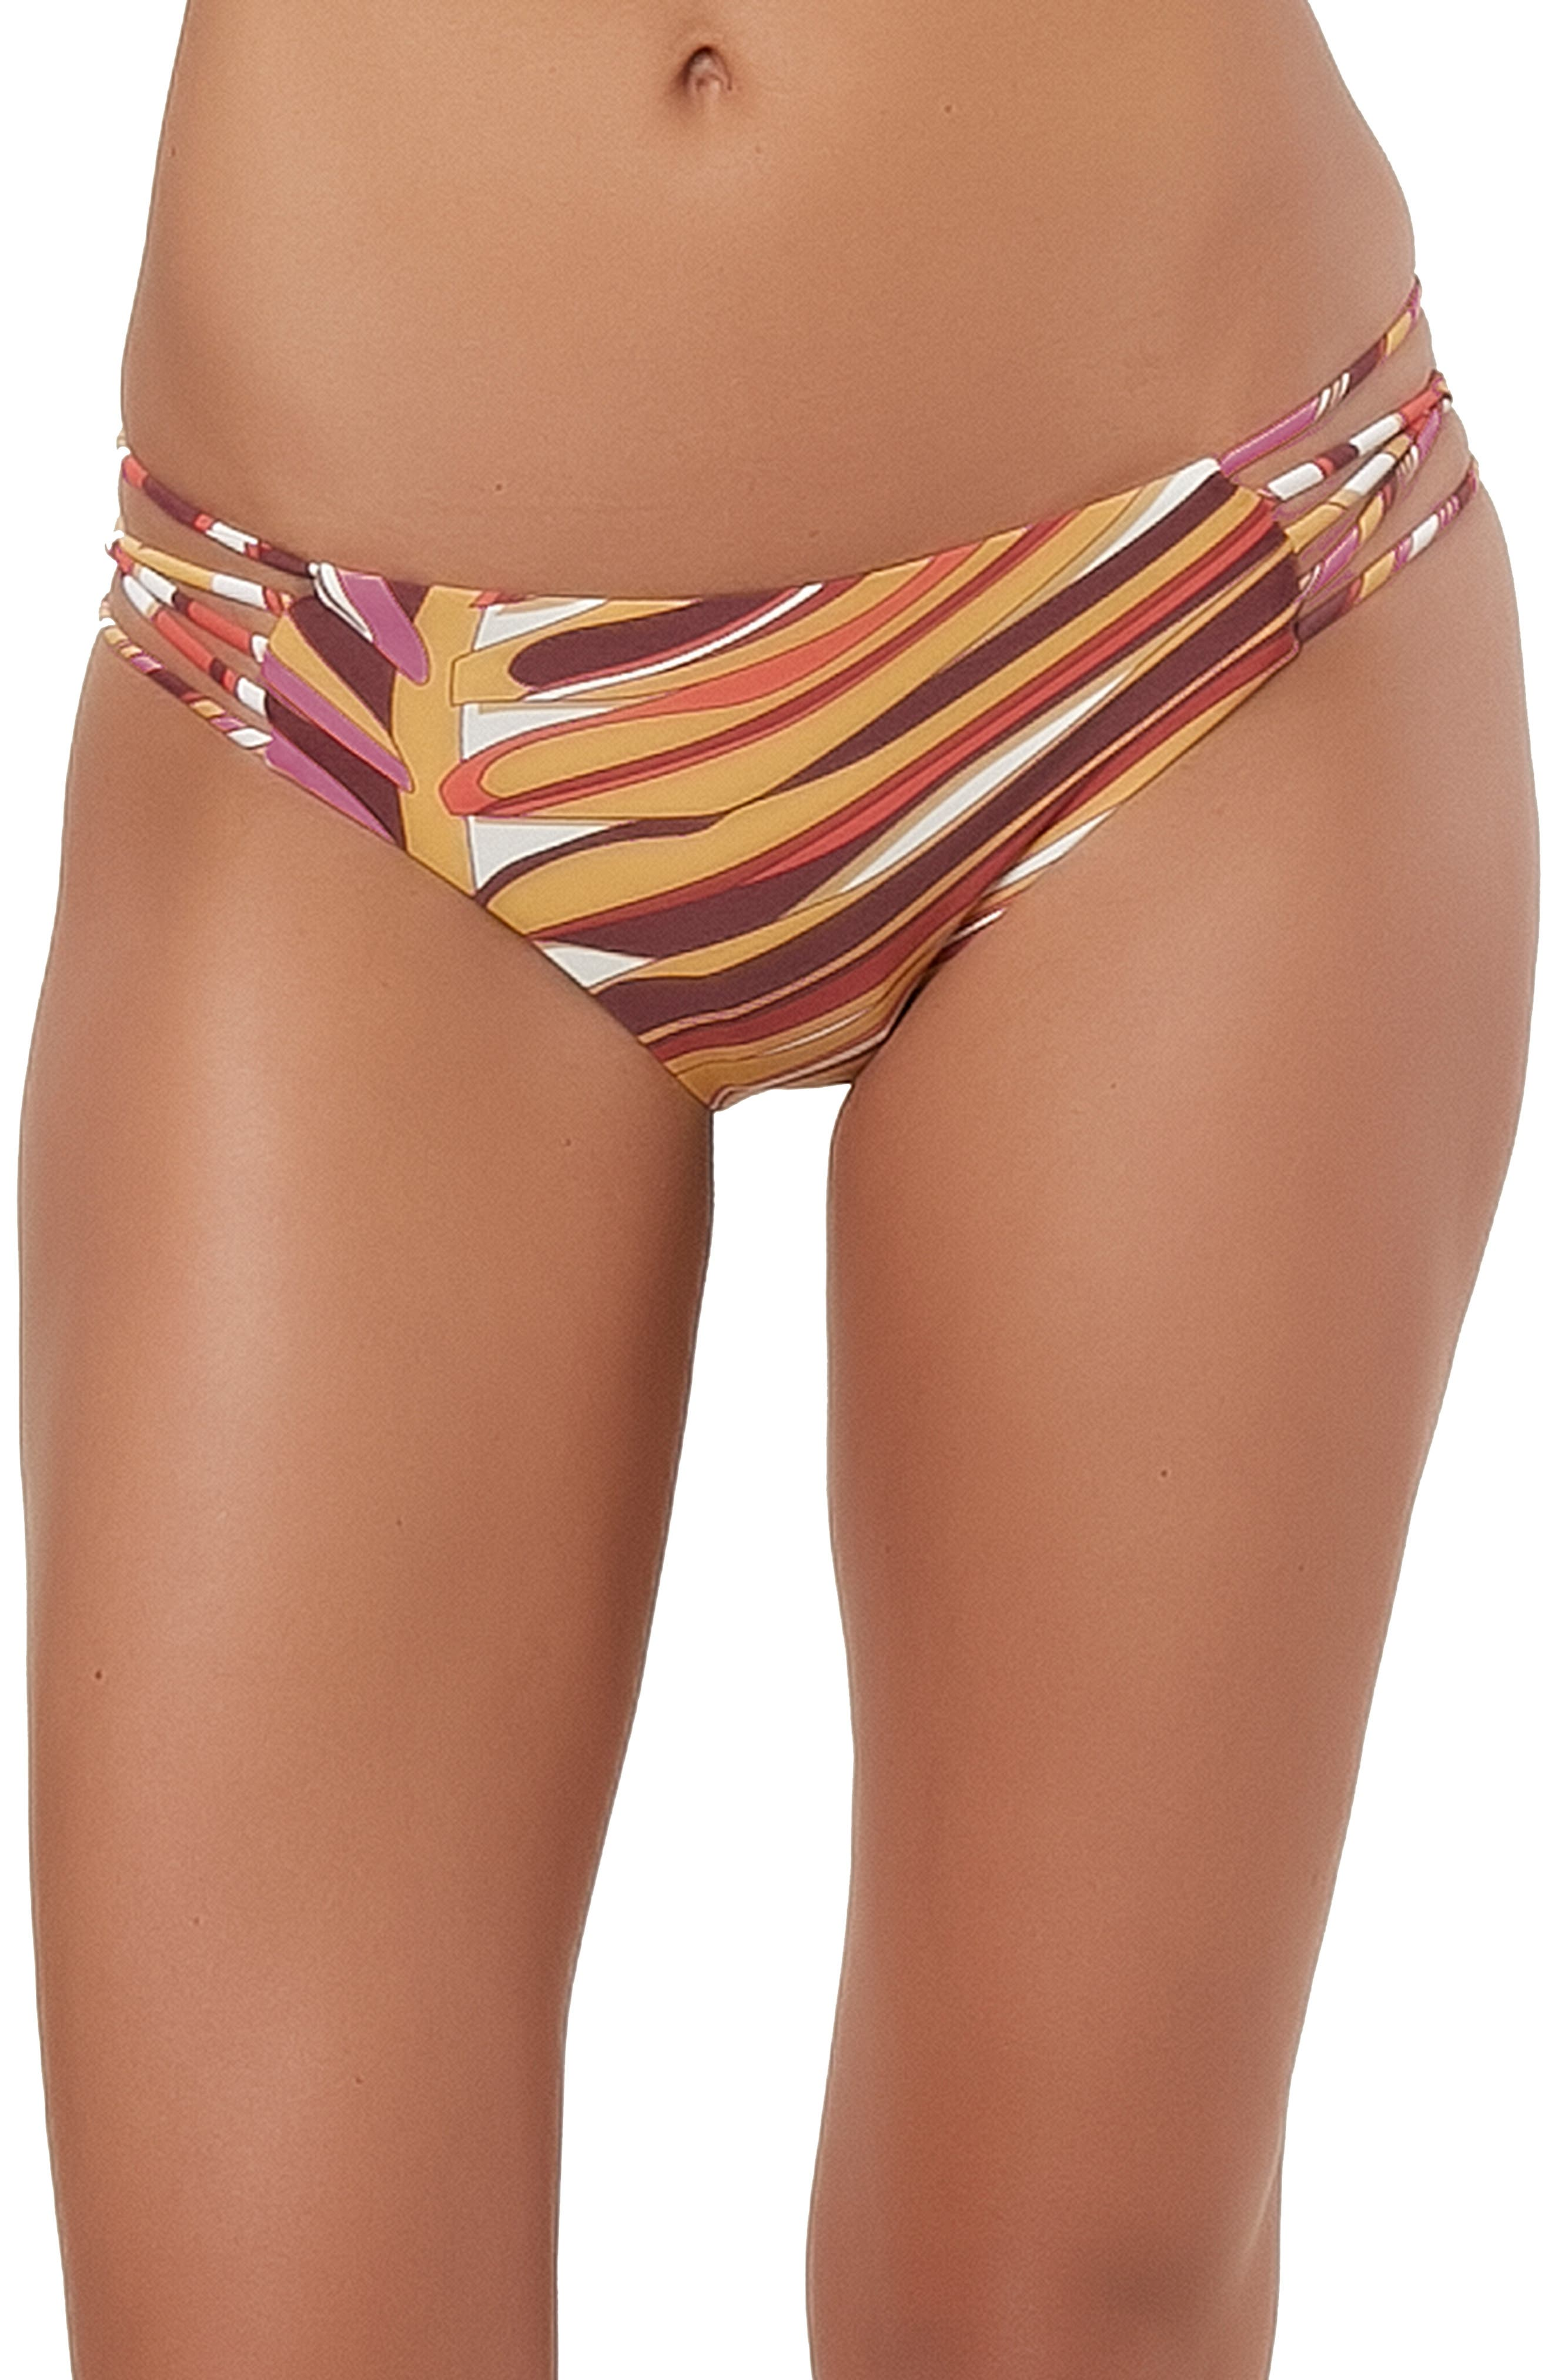 Anacapa Strappy Hipster Bikini Bottoms,                             Main thumbnail 1, color,                             PURPLE MAUVE